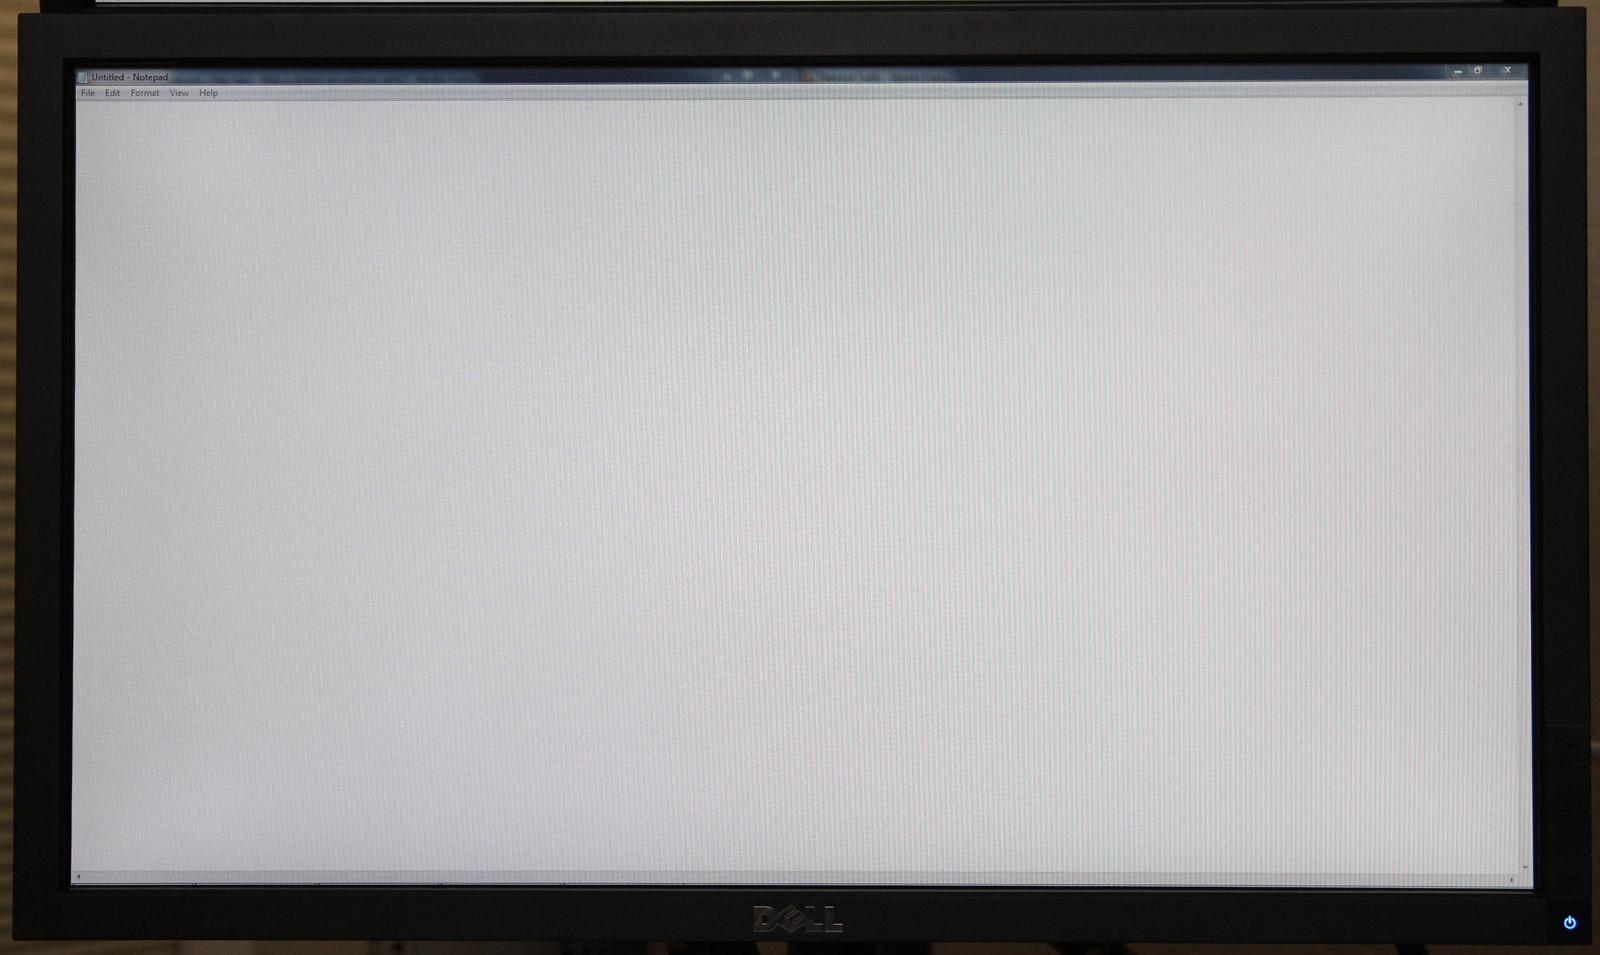 Dell UltraSharp U2311H (Dell U2311Hb) LCD Monitor Review